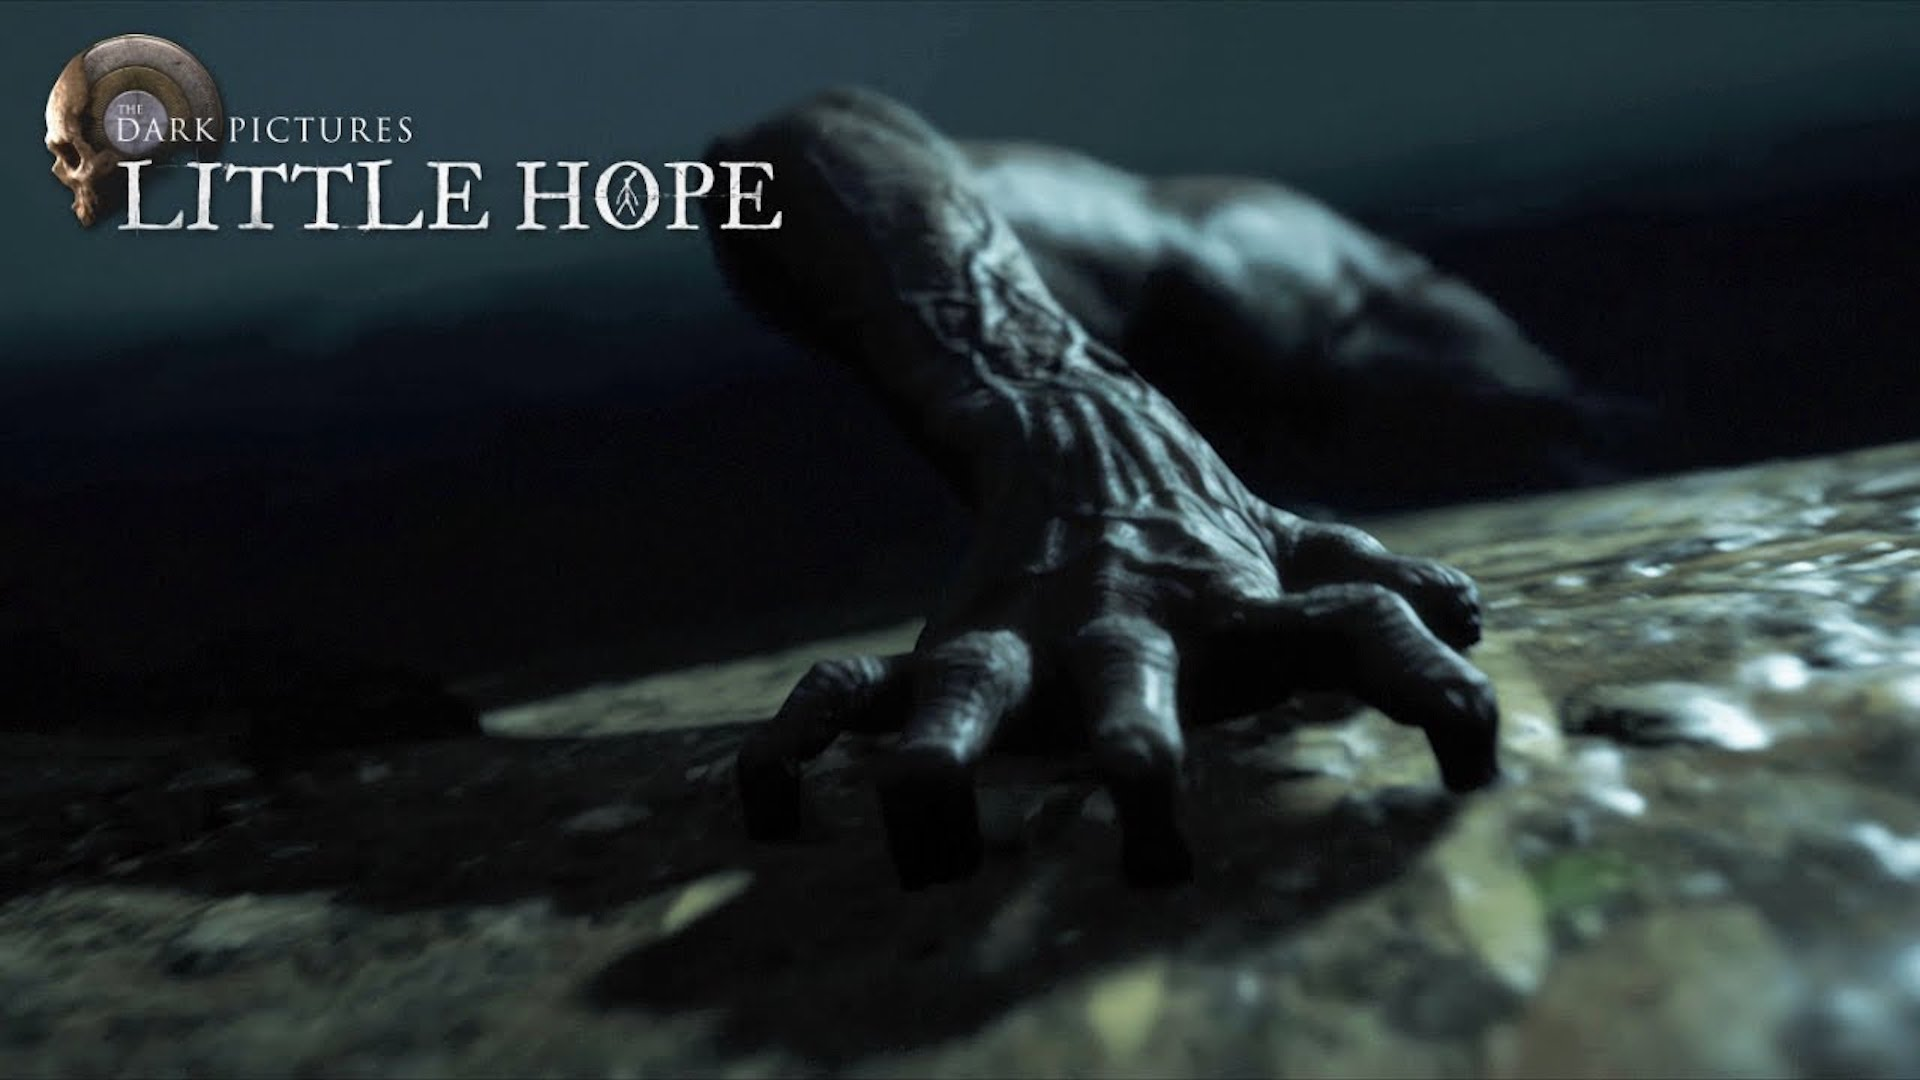 تاریخ انتشار بازی The Dark Pictures Anthology